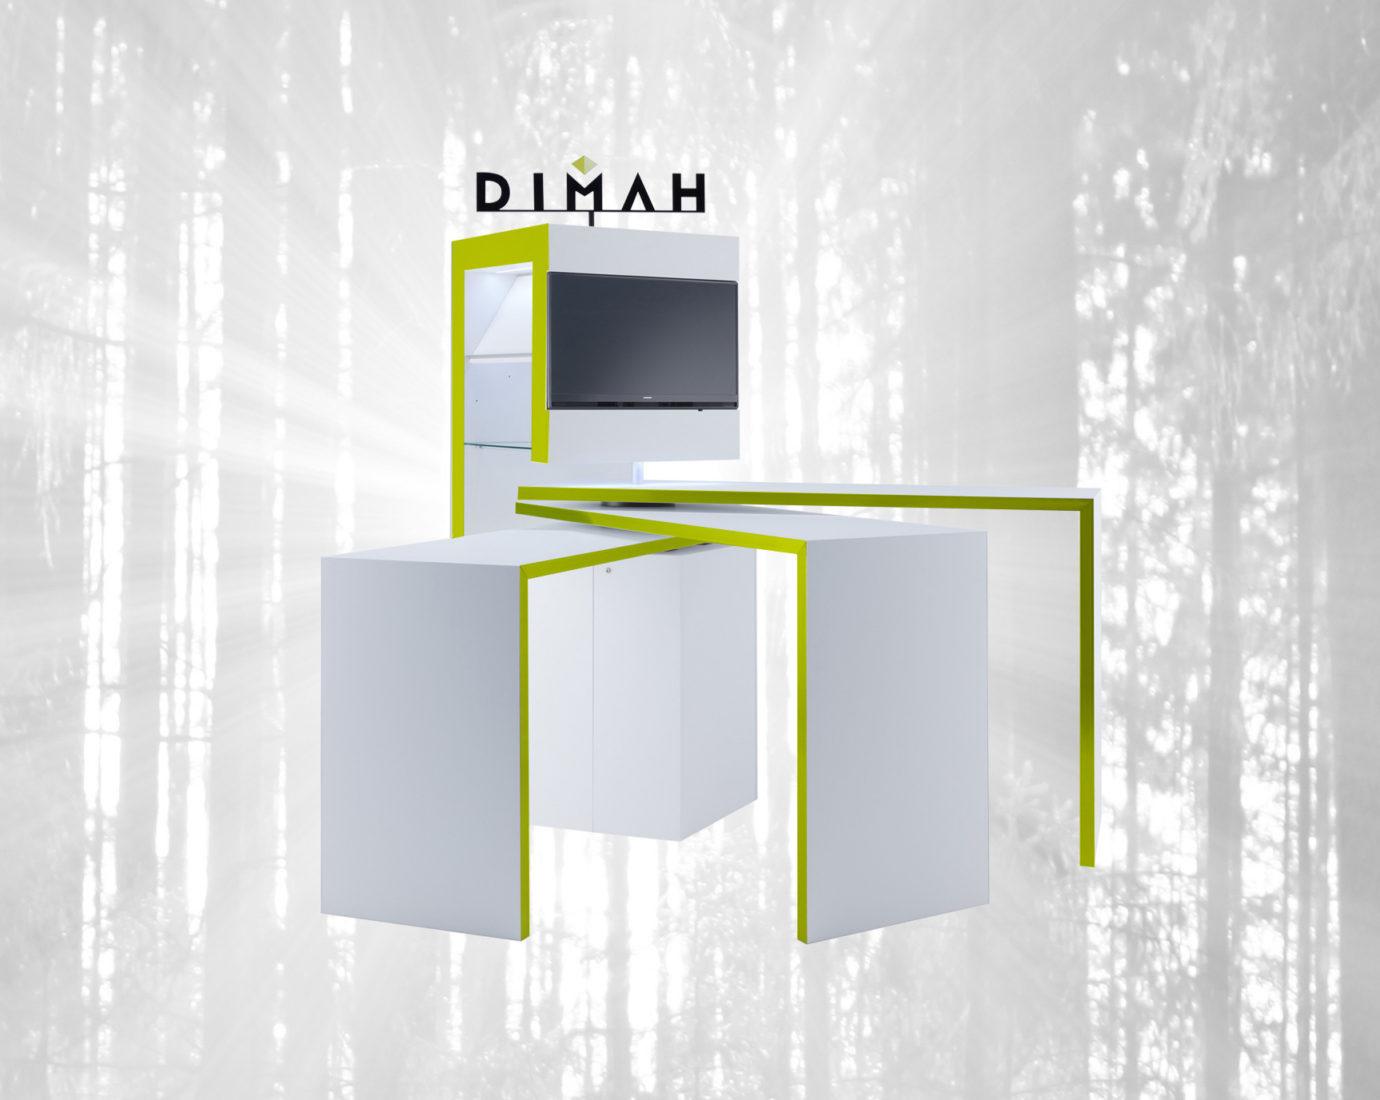 DIMAH - SPINit! Präsentationssystem und Markenkommunikationsmöbel